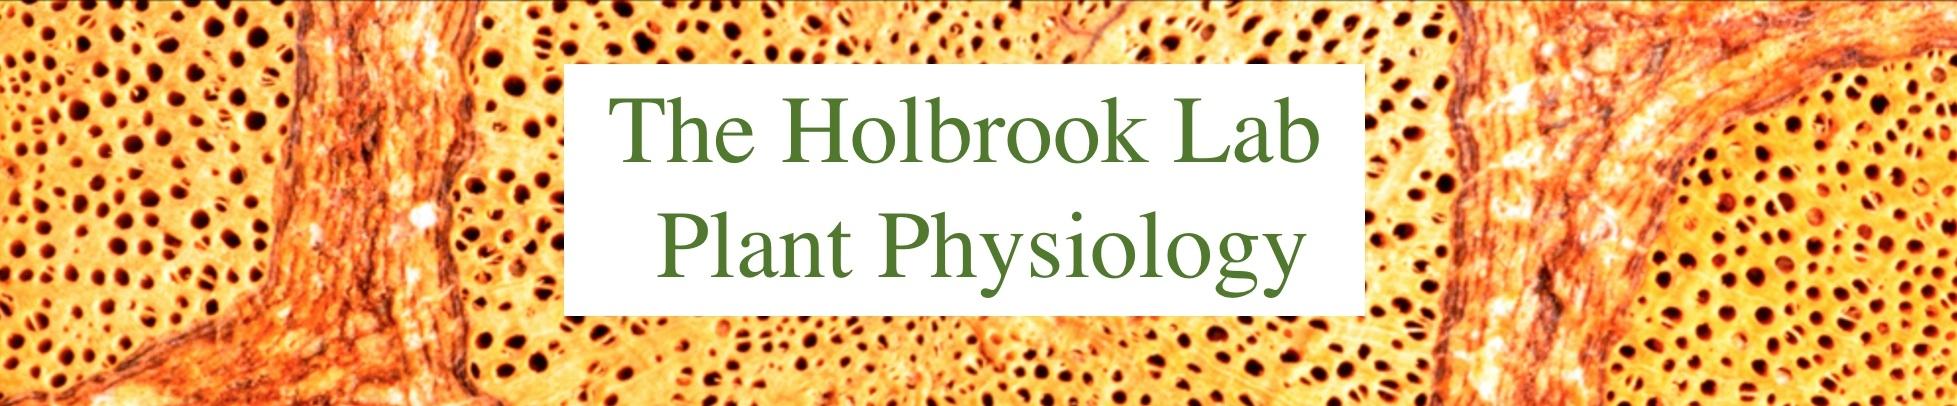 The Holbrook Group